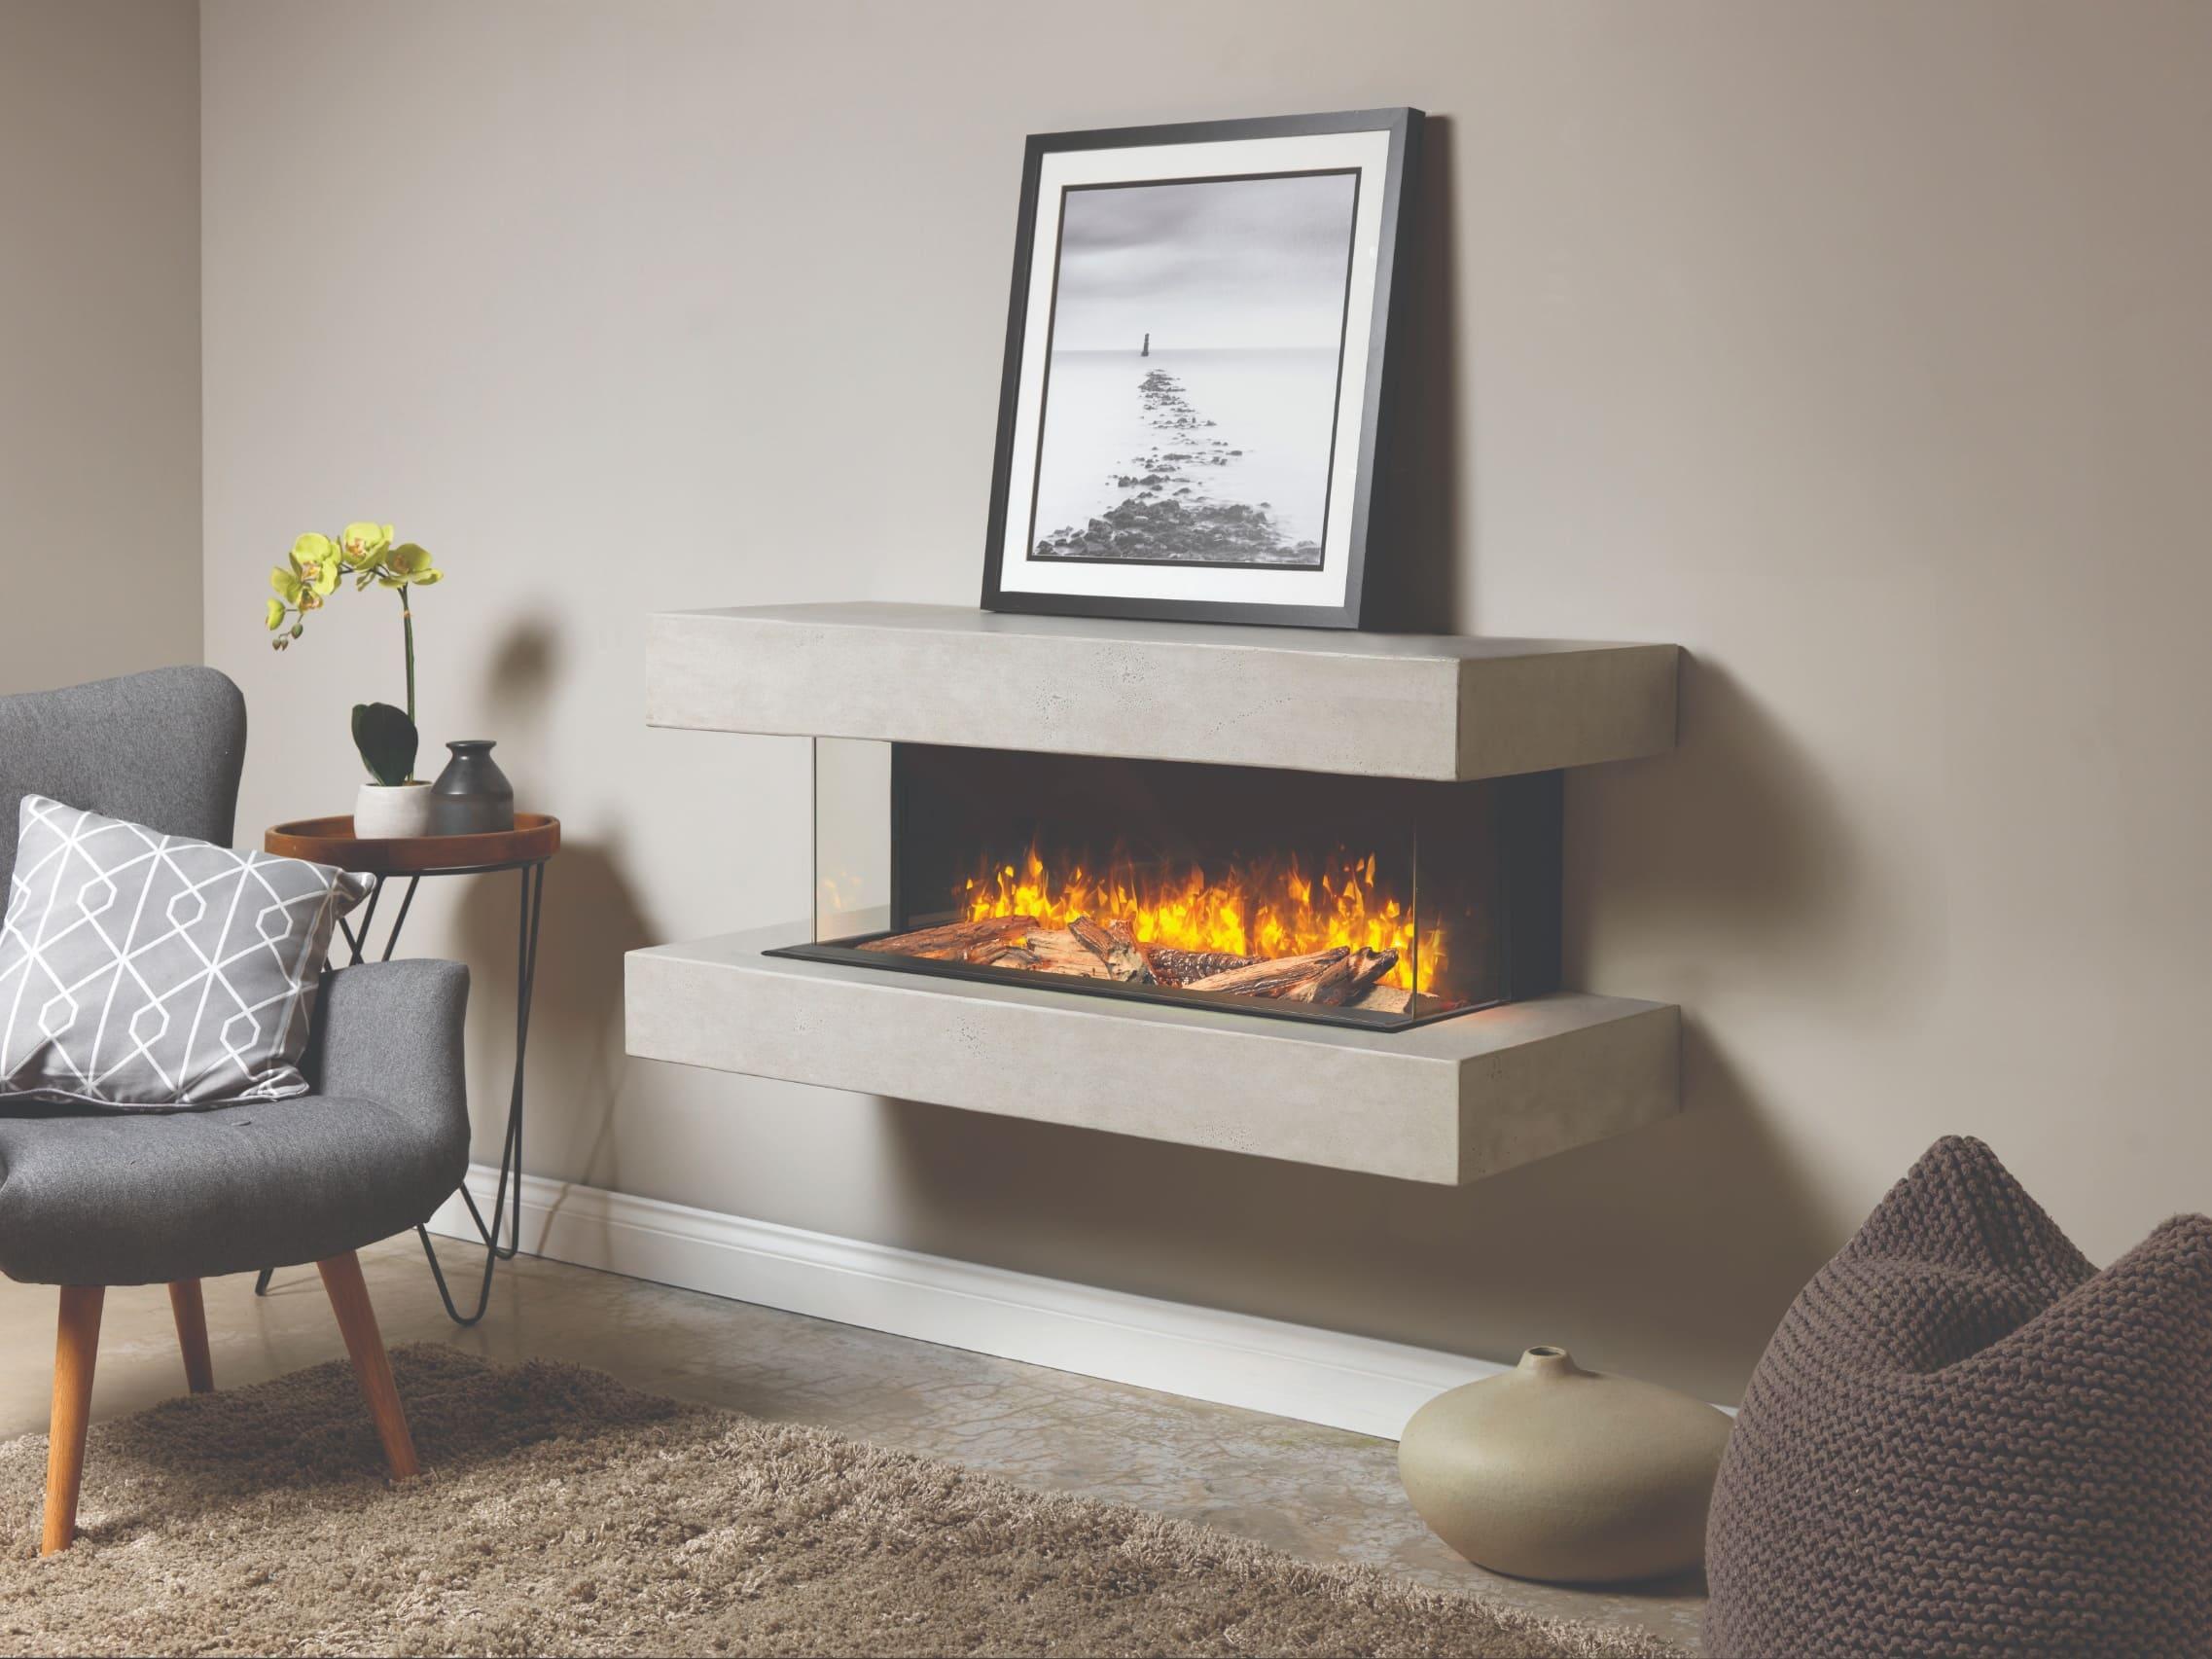 Brandon Electric Fire Suite - Premium Vintage Concrete Effect Wall-Mounted